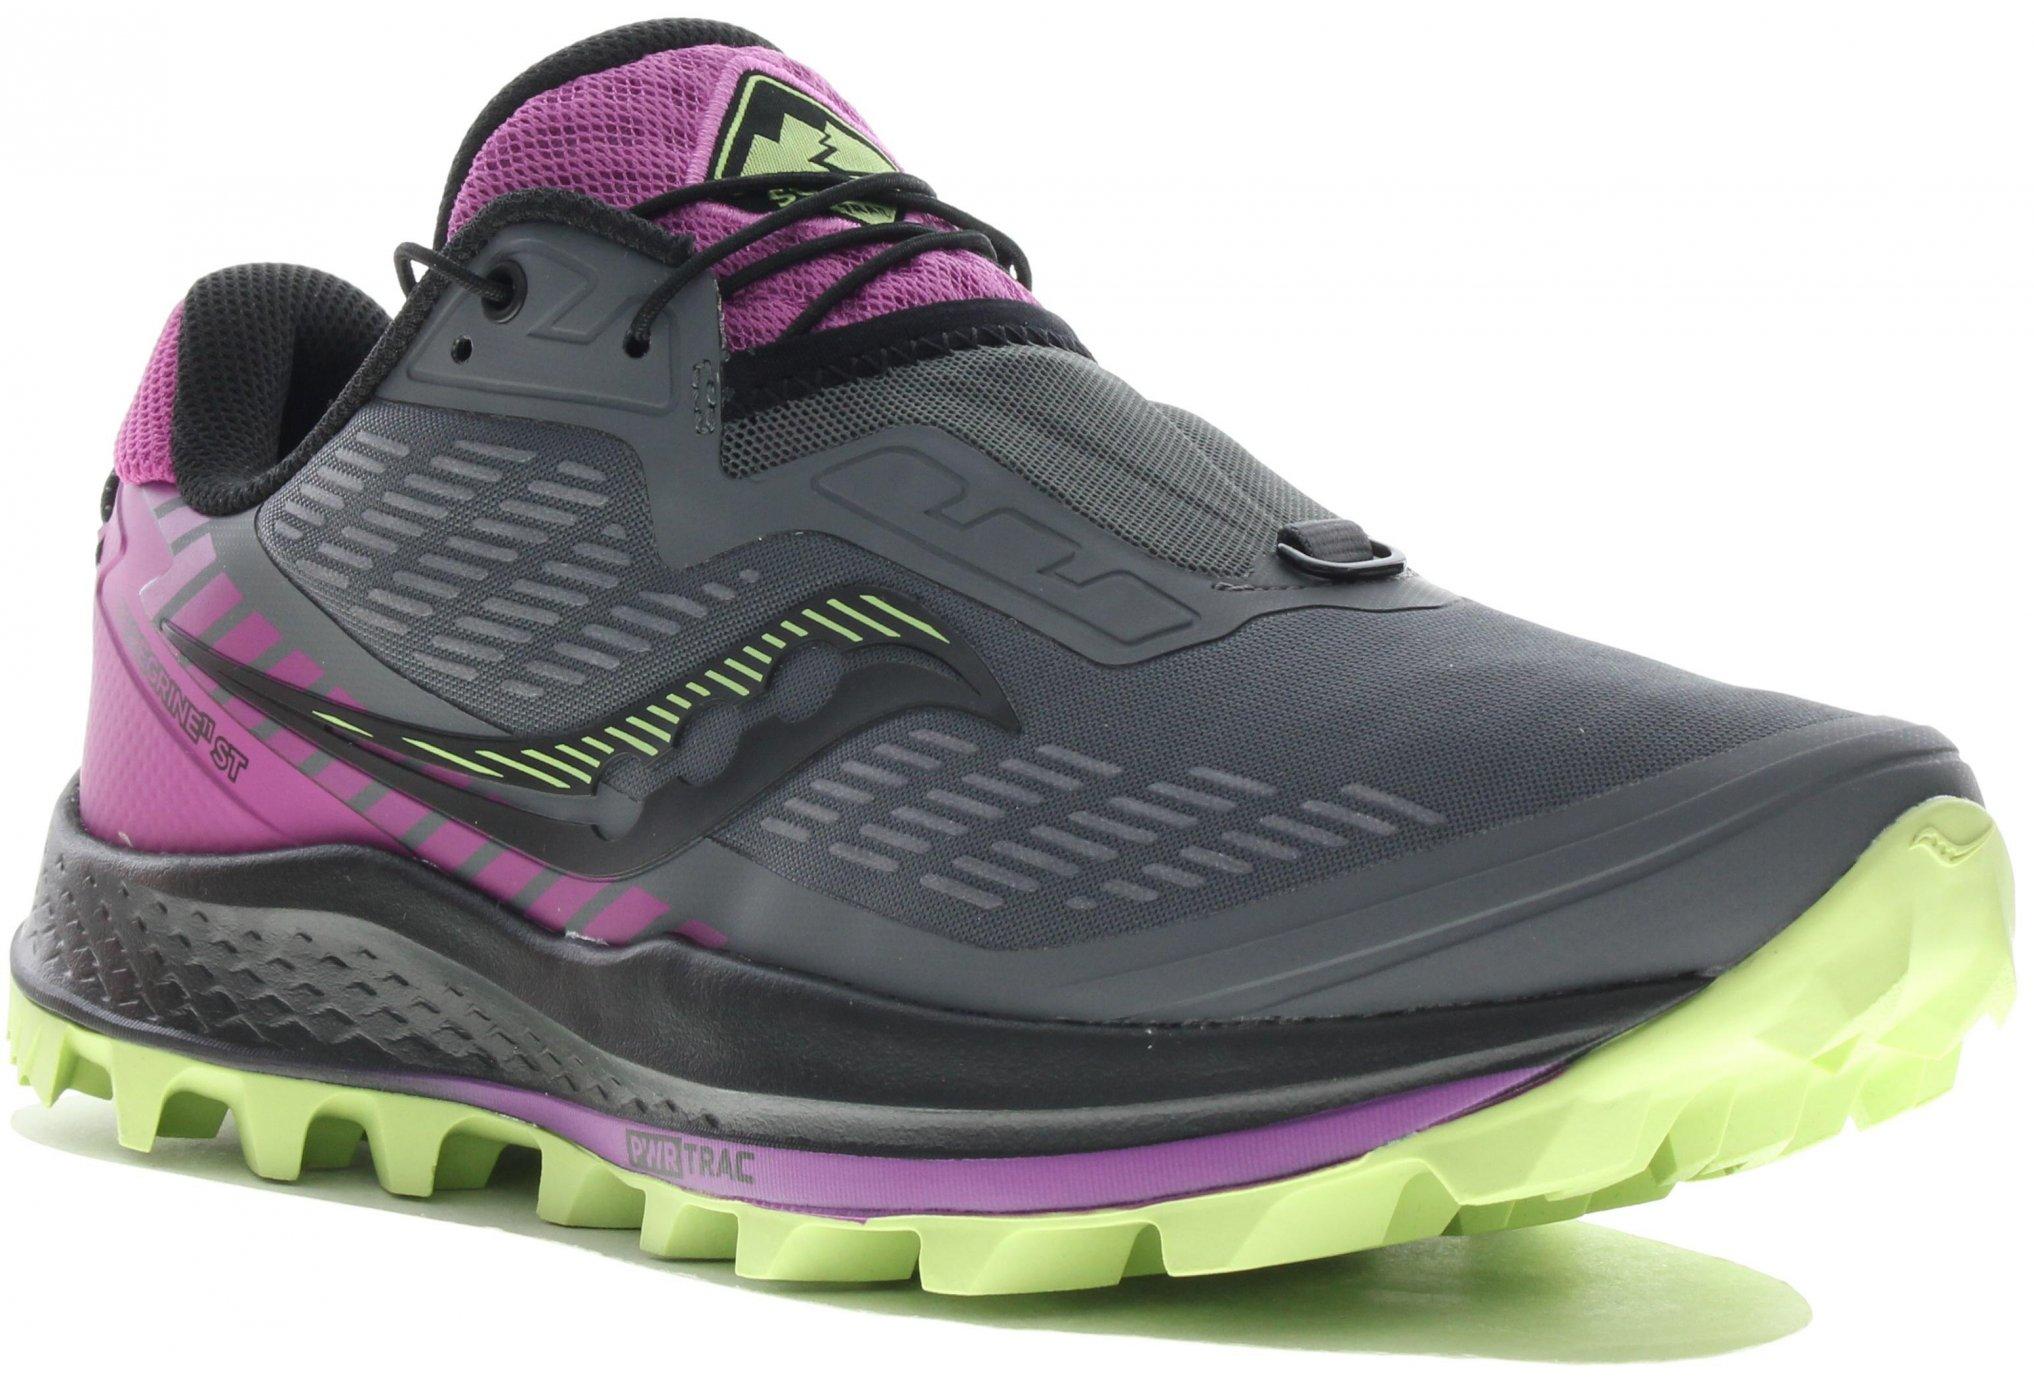 Saucony Peregrine 11 ST W Chaussures running femme